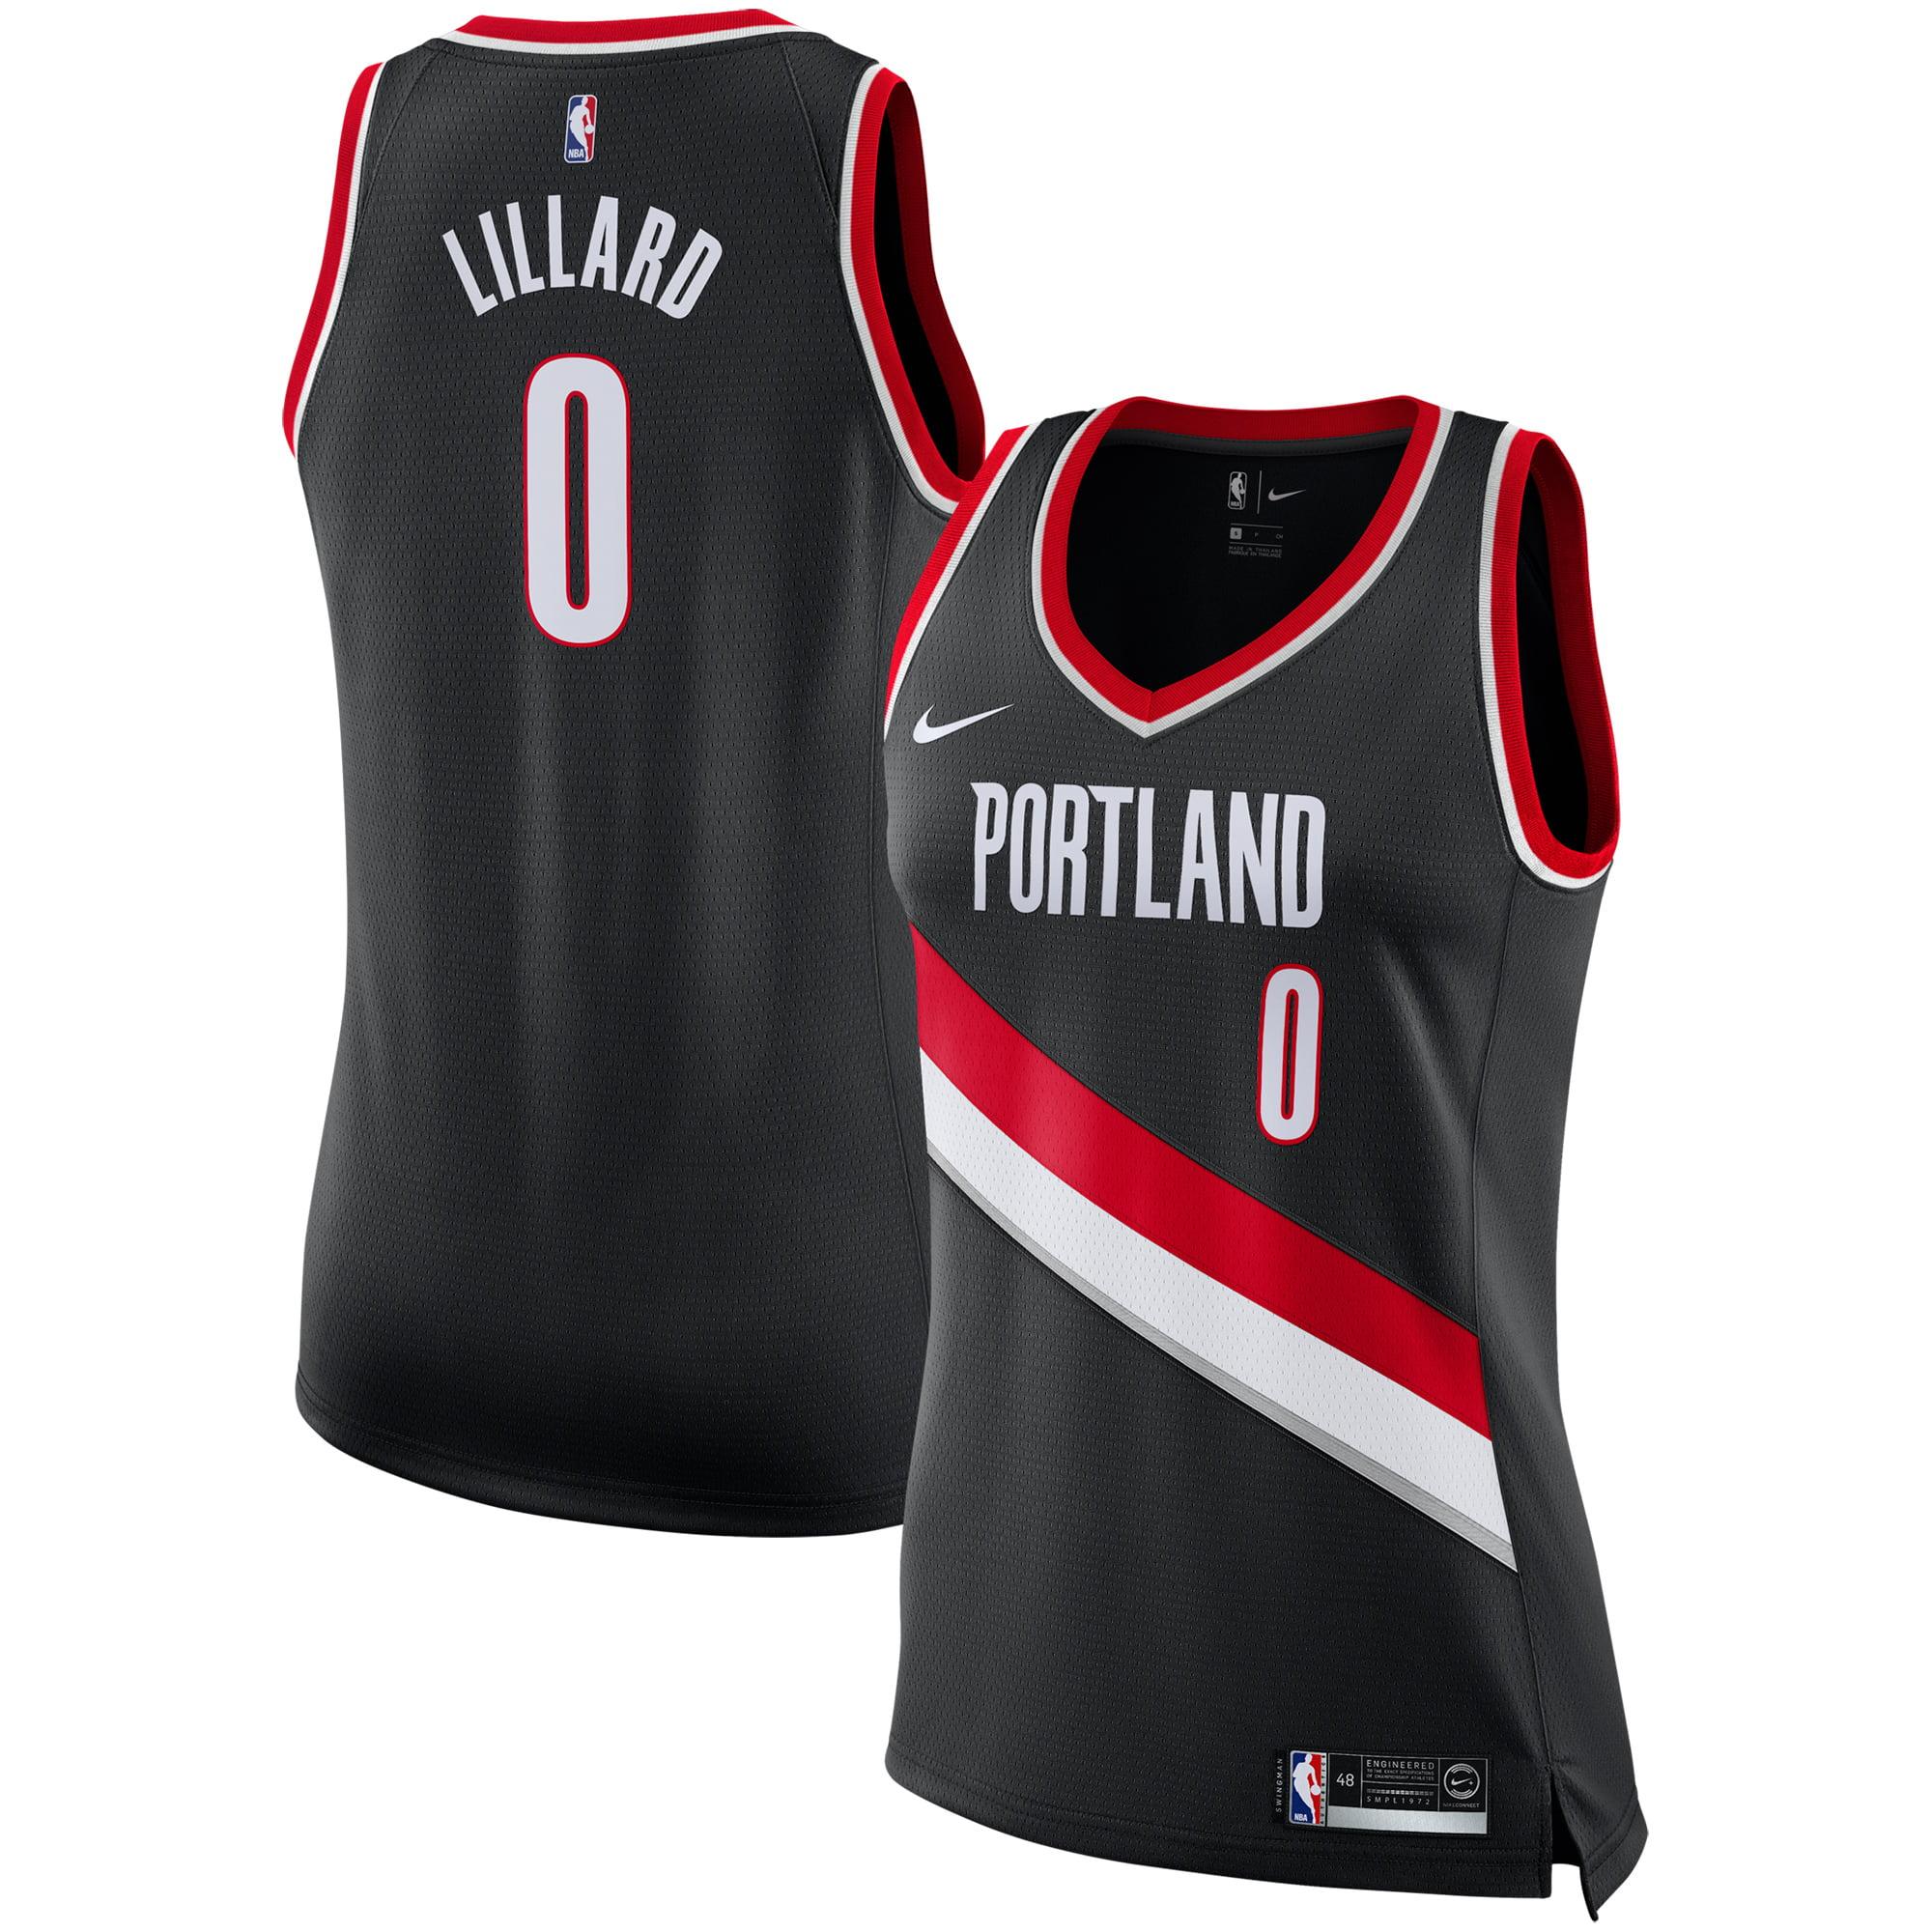 Damian Lillard Portland Trail Blazers Nike Women s Swingman Jersey - Black  - Icon Edition - Walmart.com 17fc5381a3